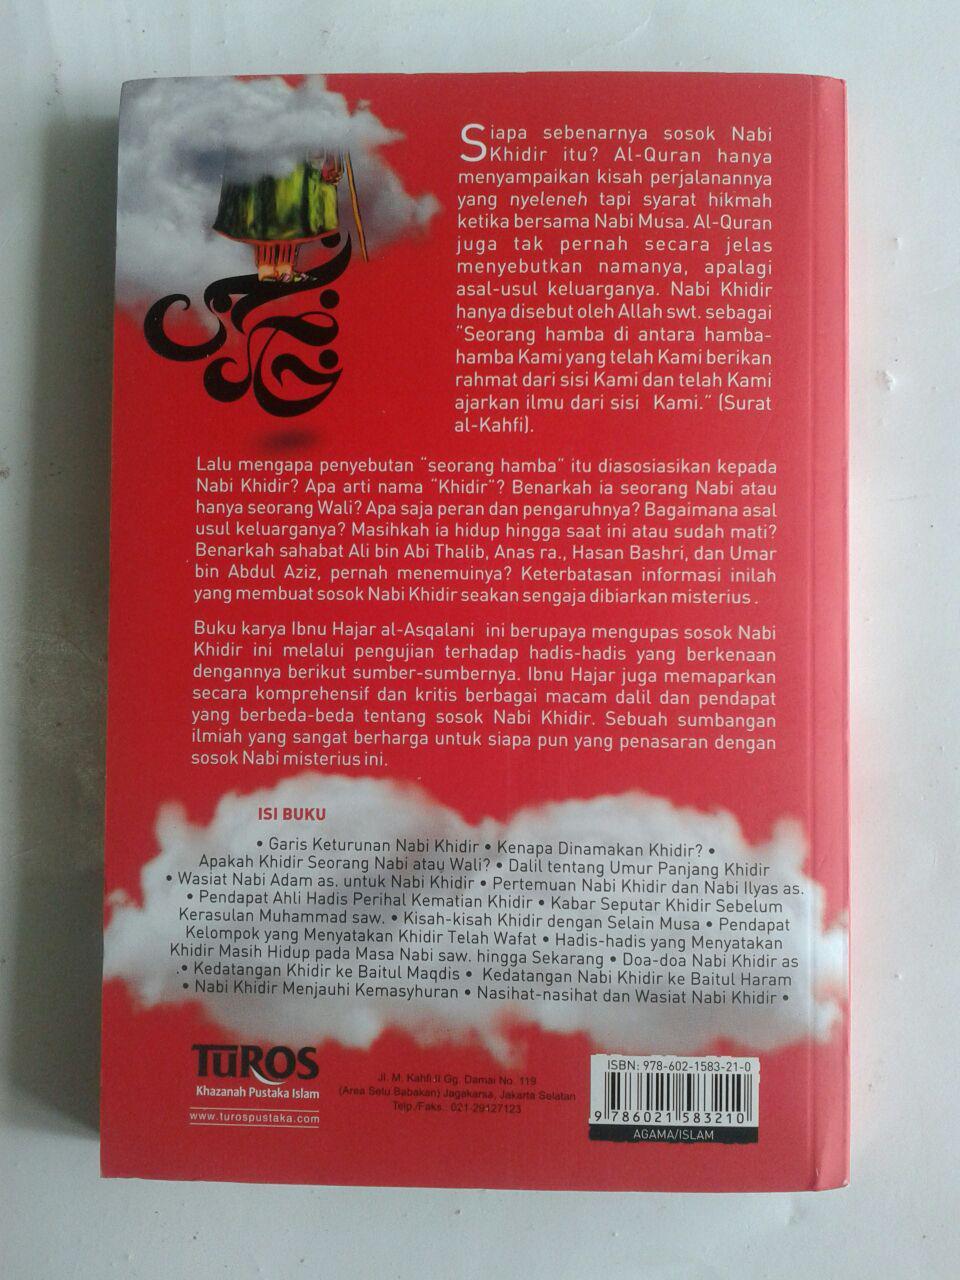 Buku Misteri Nabi Khidir Mengenal Nabi Misterius cover